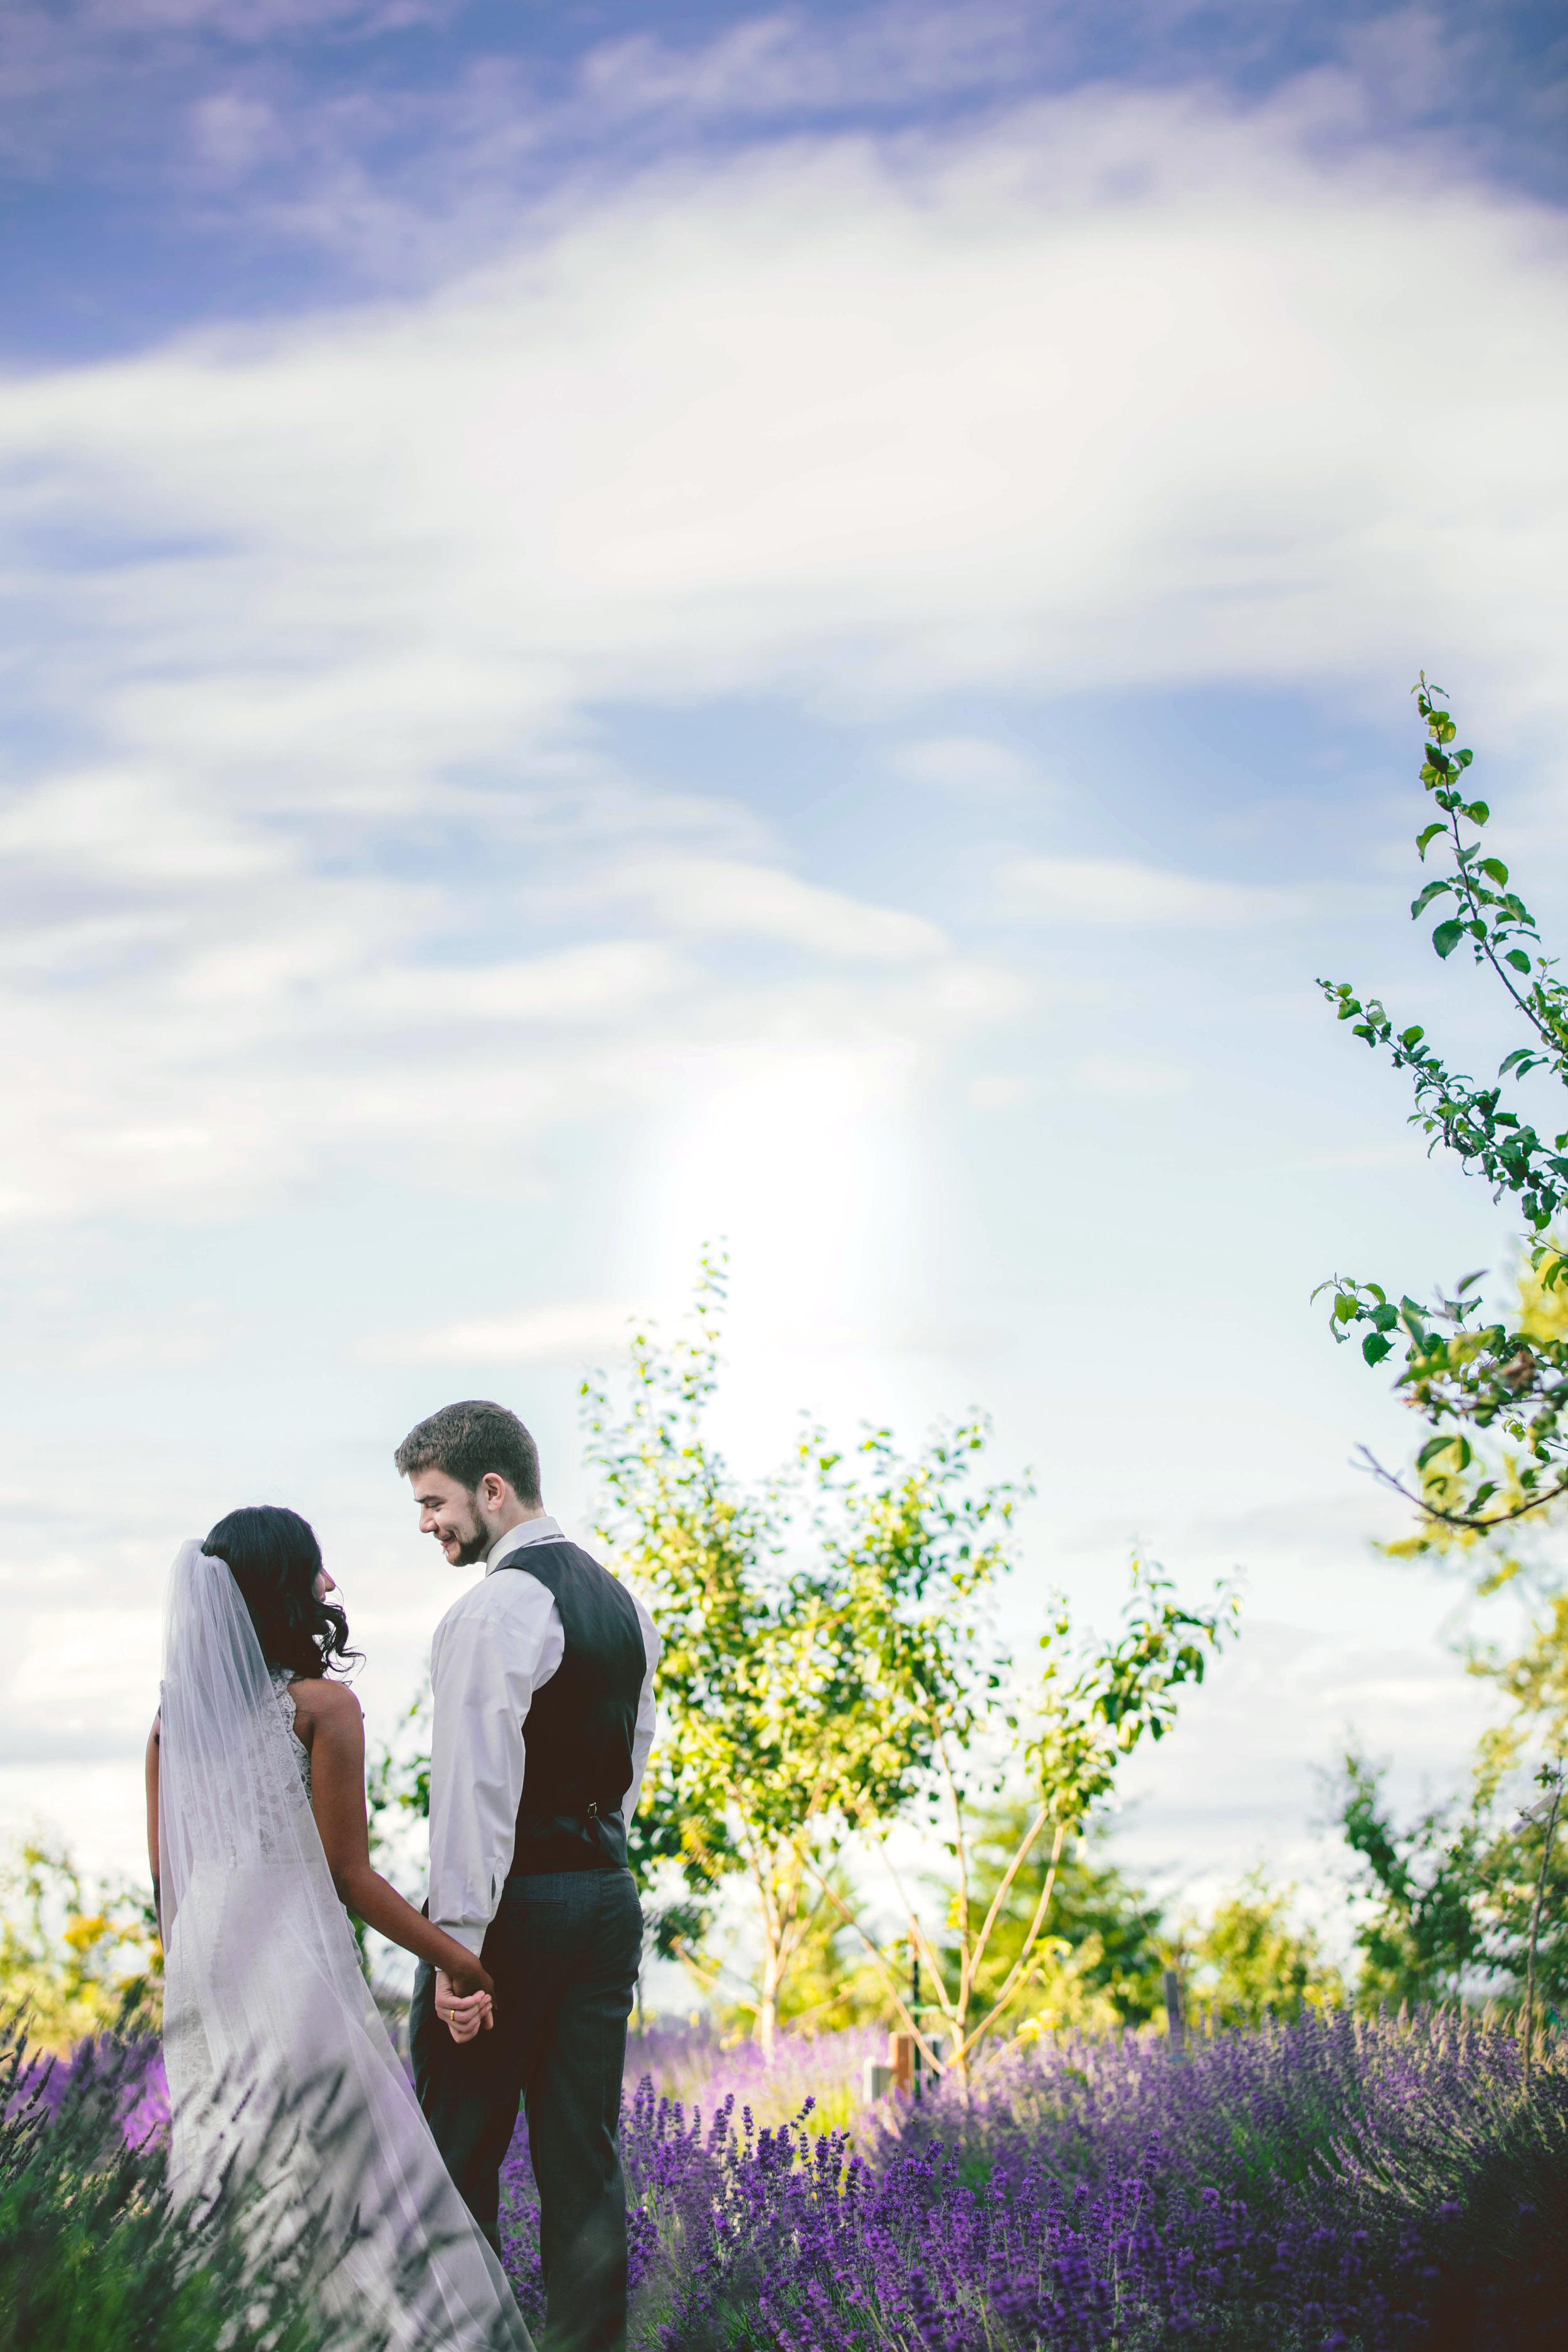 Hima+Dan_Wedding_Seattle+Couple_Kingston_6112016_5.jpg